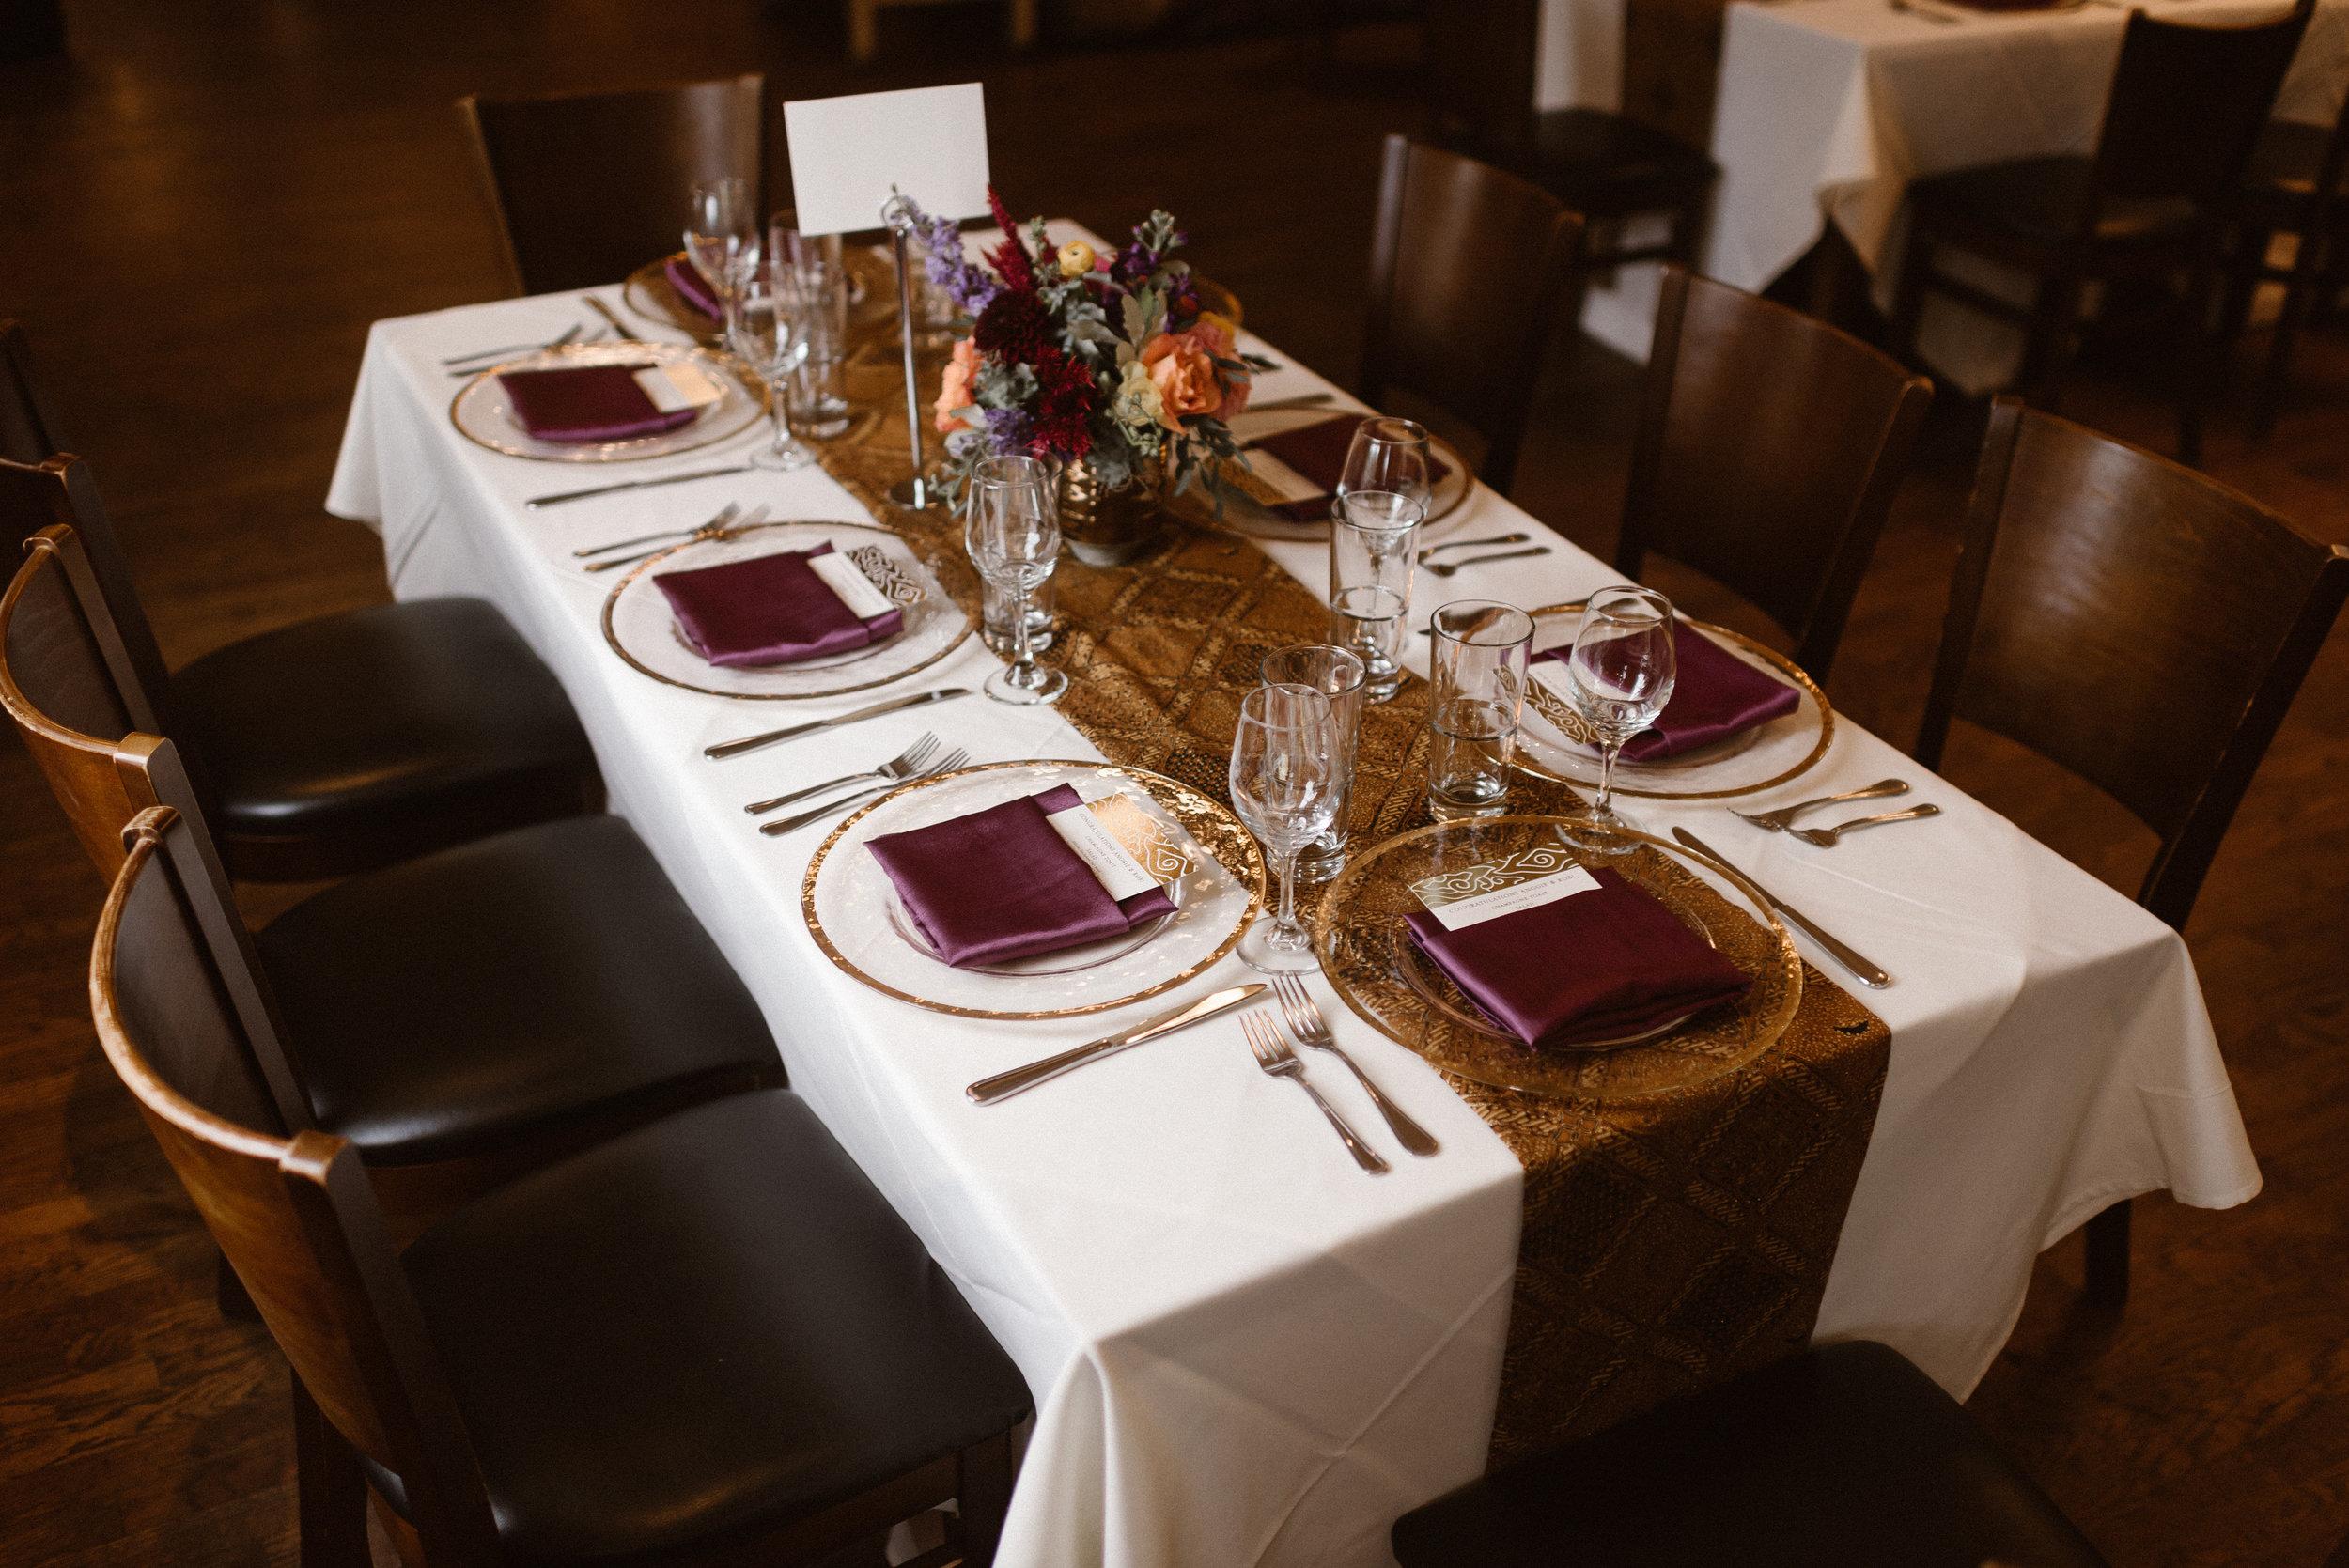 Chautauqua Dining Hall Wedding Reception Table